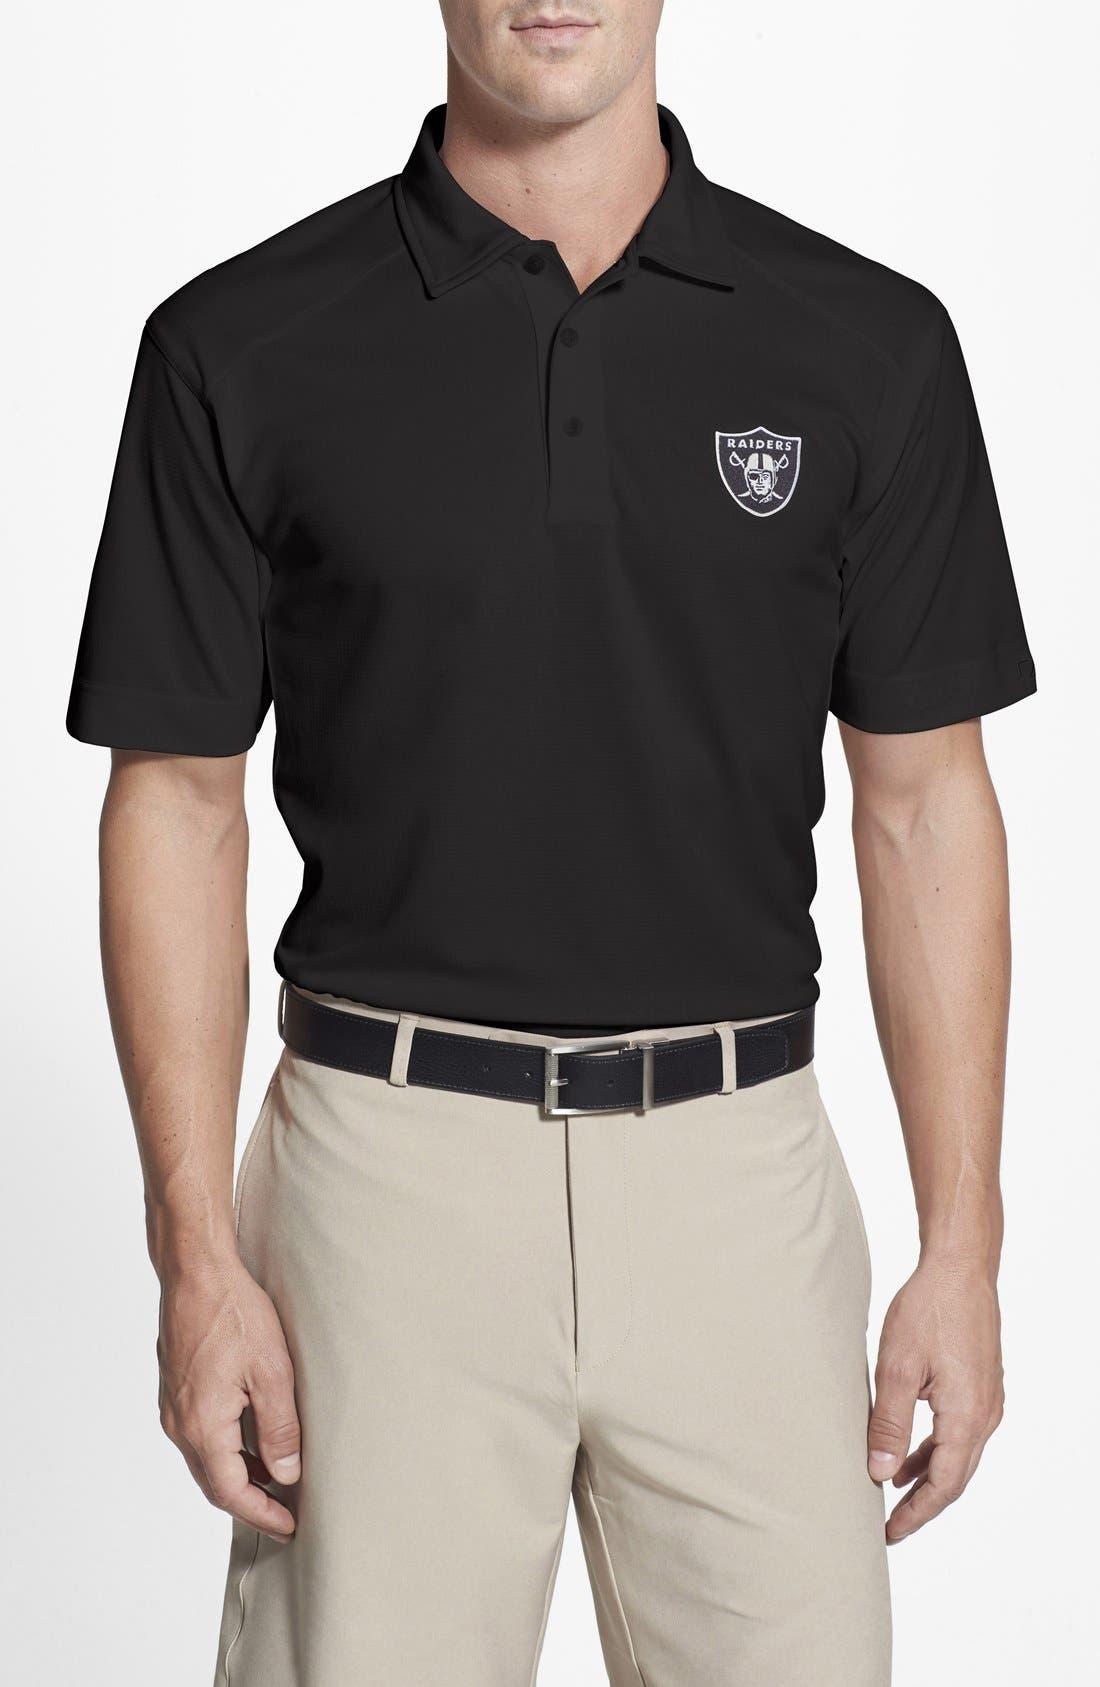 Oakland Raiders - Genre DryTec Moisture Wicking Polo,                         Main,                         color, 001